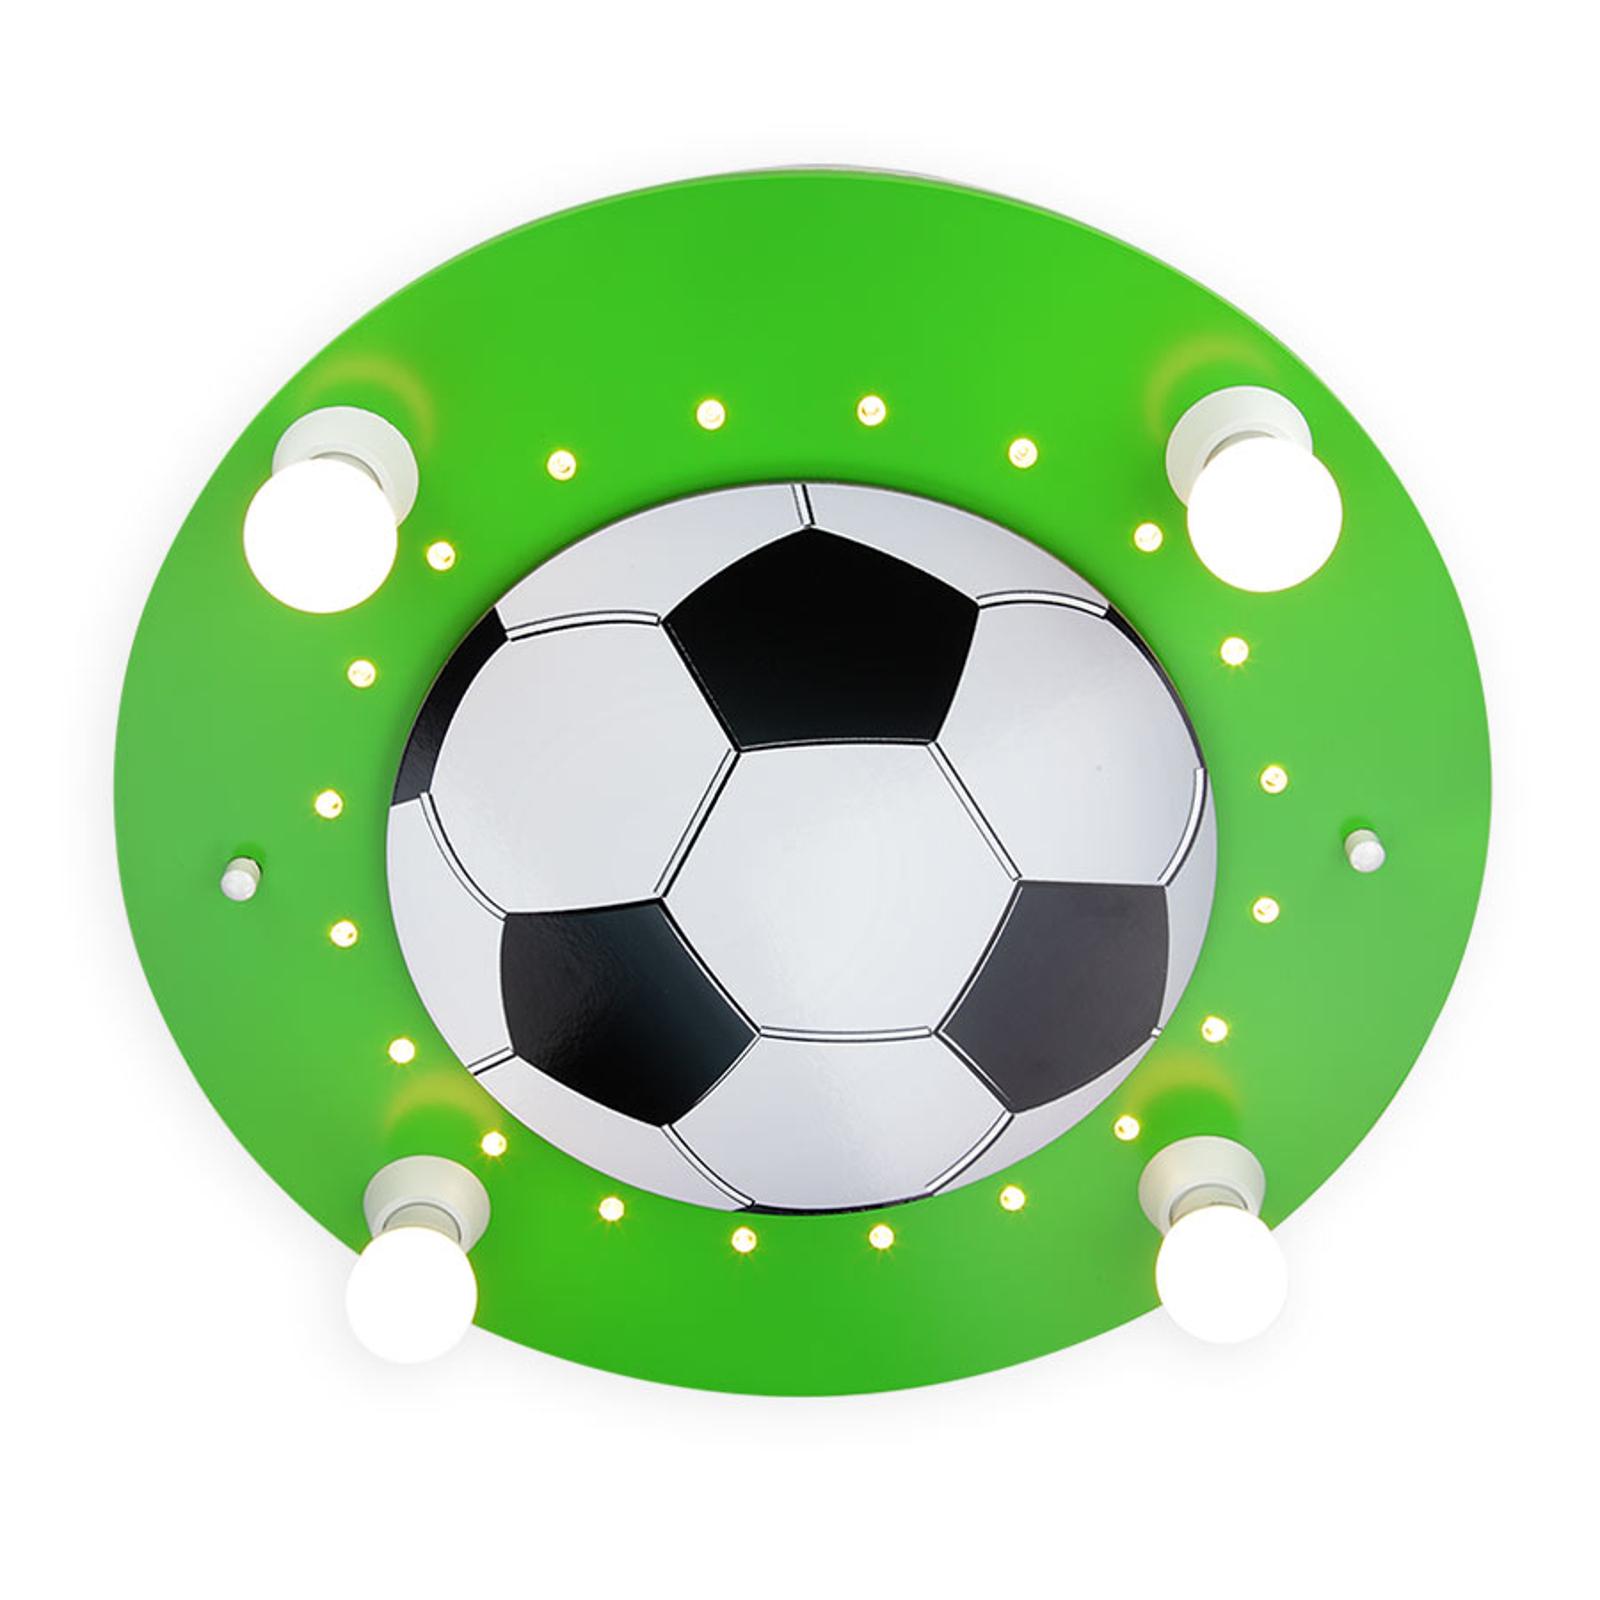 Plafondlamp Voetbal, 4-lamps donkergroen-wit